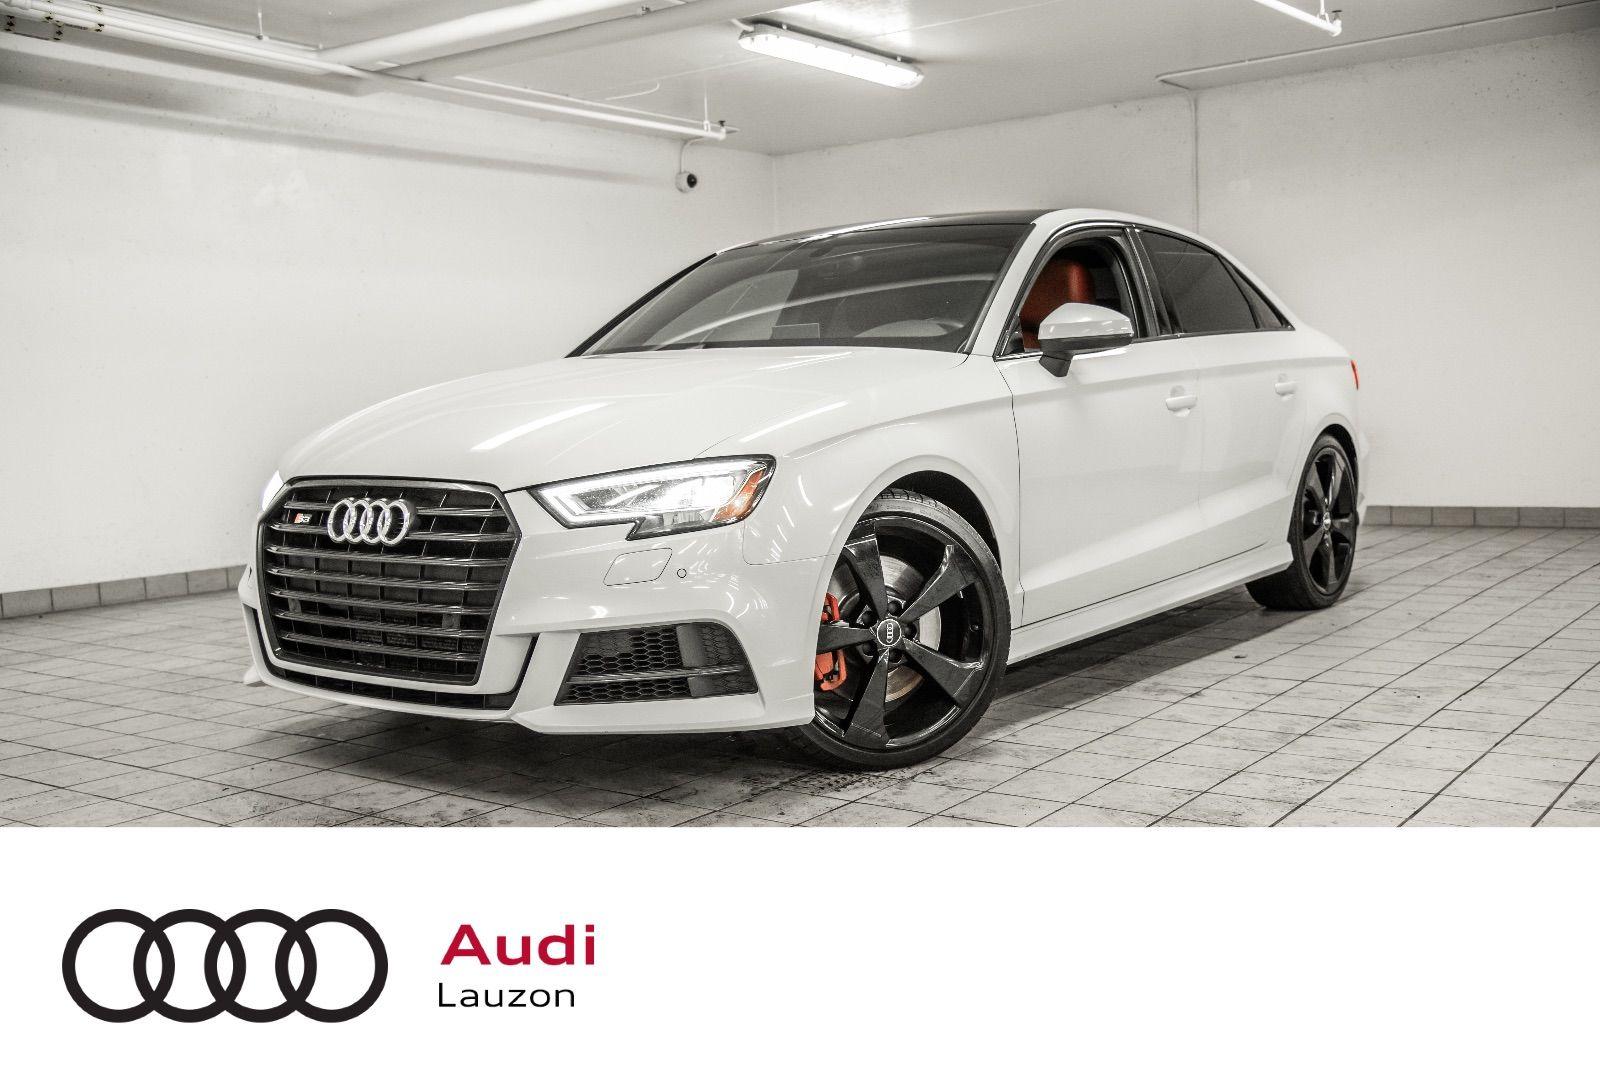 Audi Lauzon Pre Owned 2019 Audi S3 Sedan Technik Black Optics Advance Handling Rotor For Sale In Laval